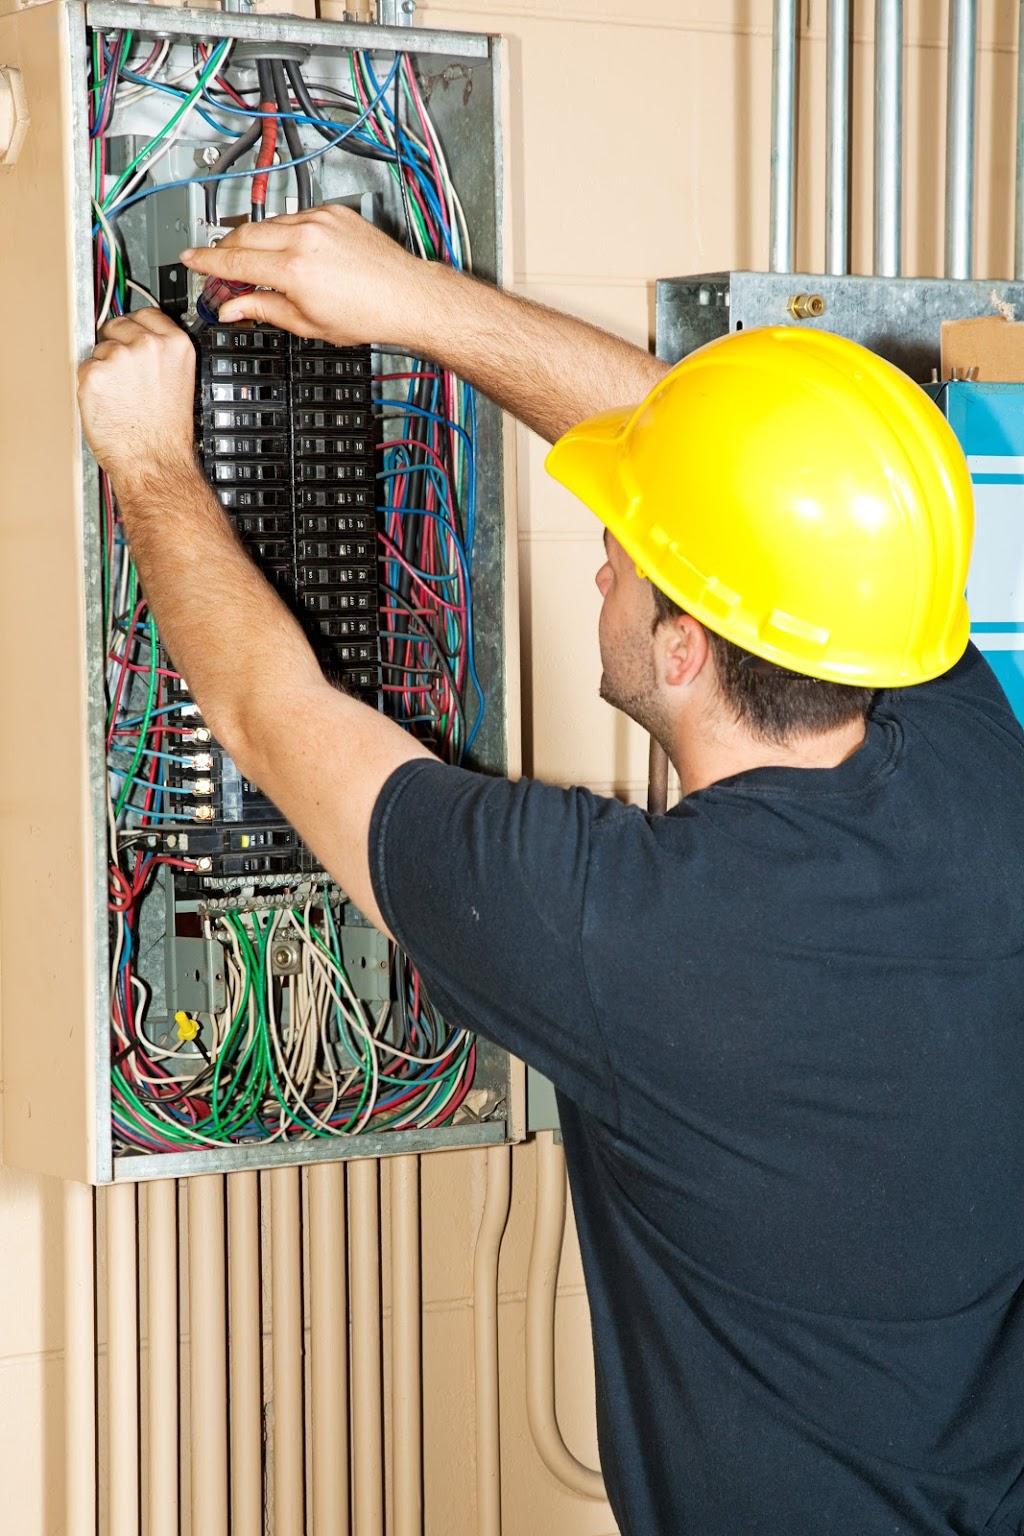 Hurstville Electrician | electrician | Level 2 Electrician Hurstville, No Power Electrician, Emergency Electric Connect, Hurstville NSW 2220, Australia | 0488859413 OR +61 488 859 413